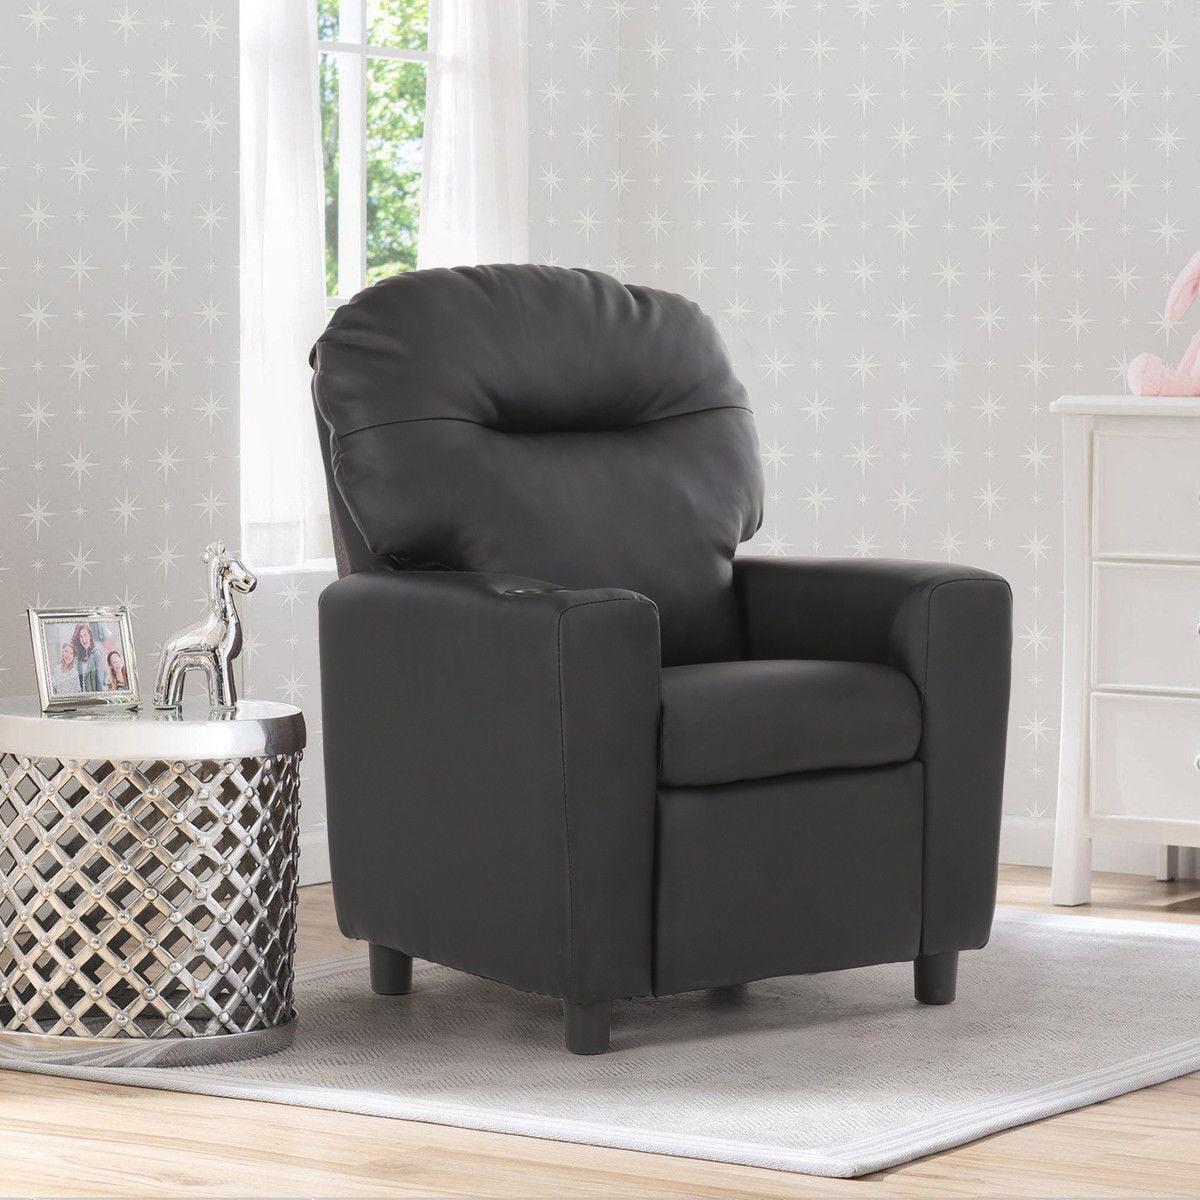 Costway Kids Sofa Recliner Armrest Couch Children Living Room